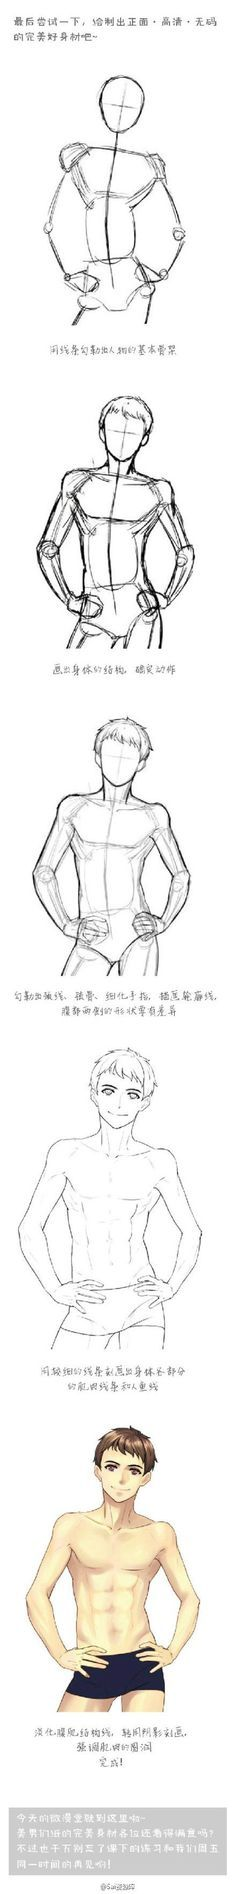 Man torso reference